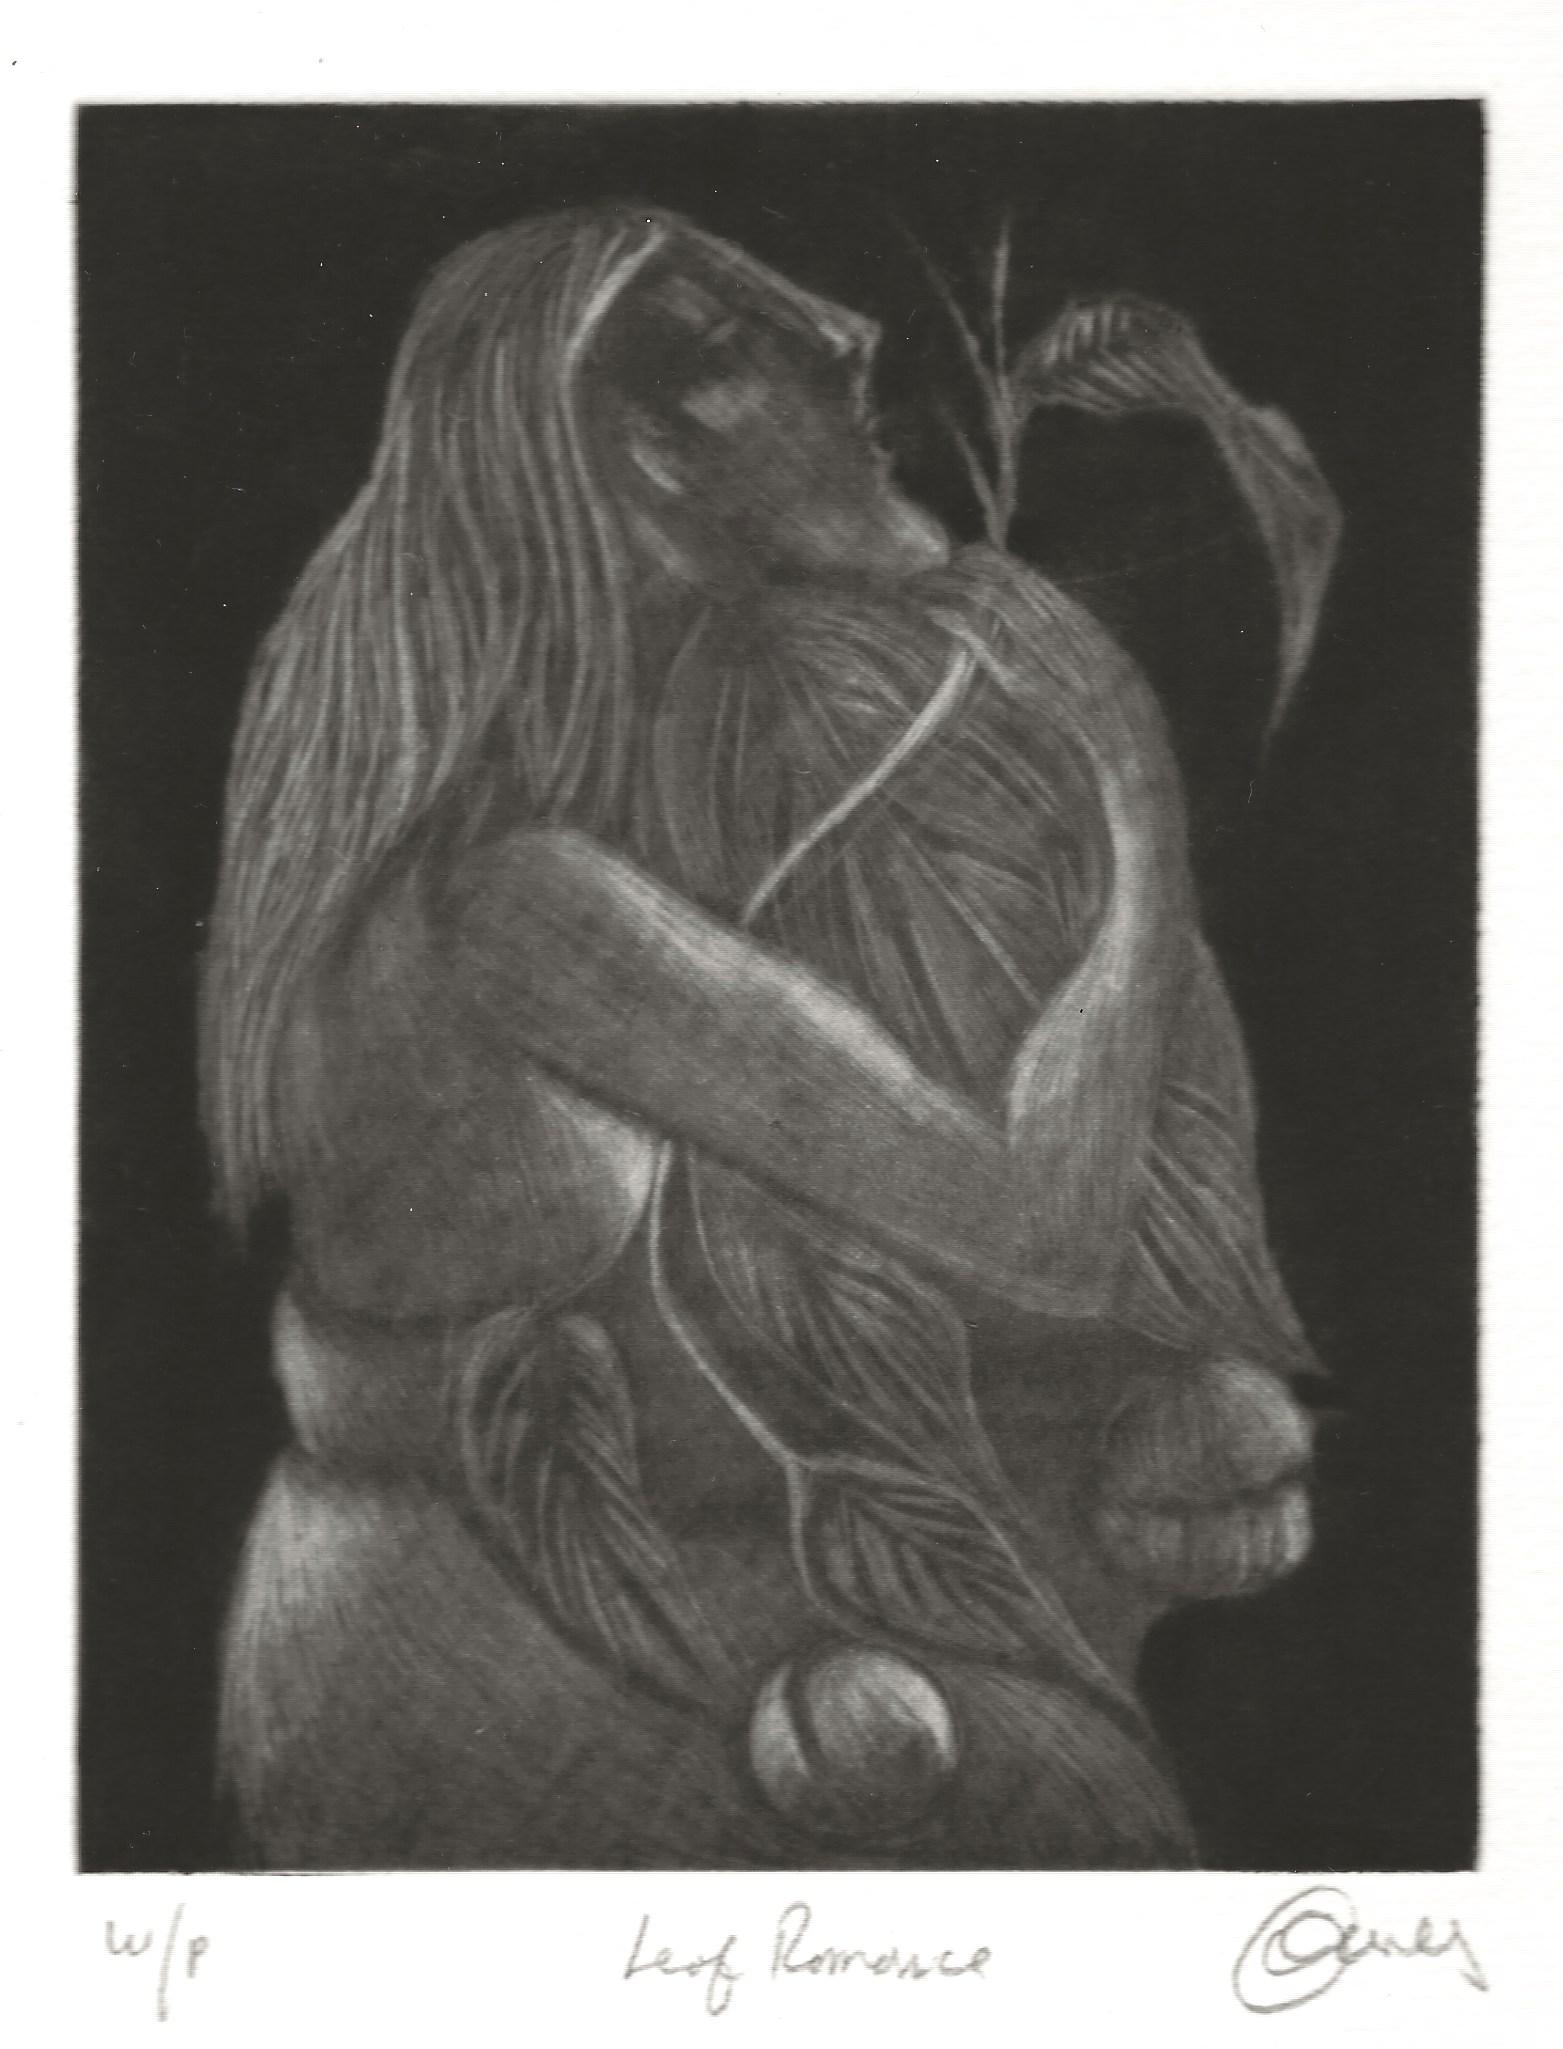 Leaf Romance, 2002